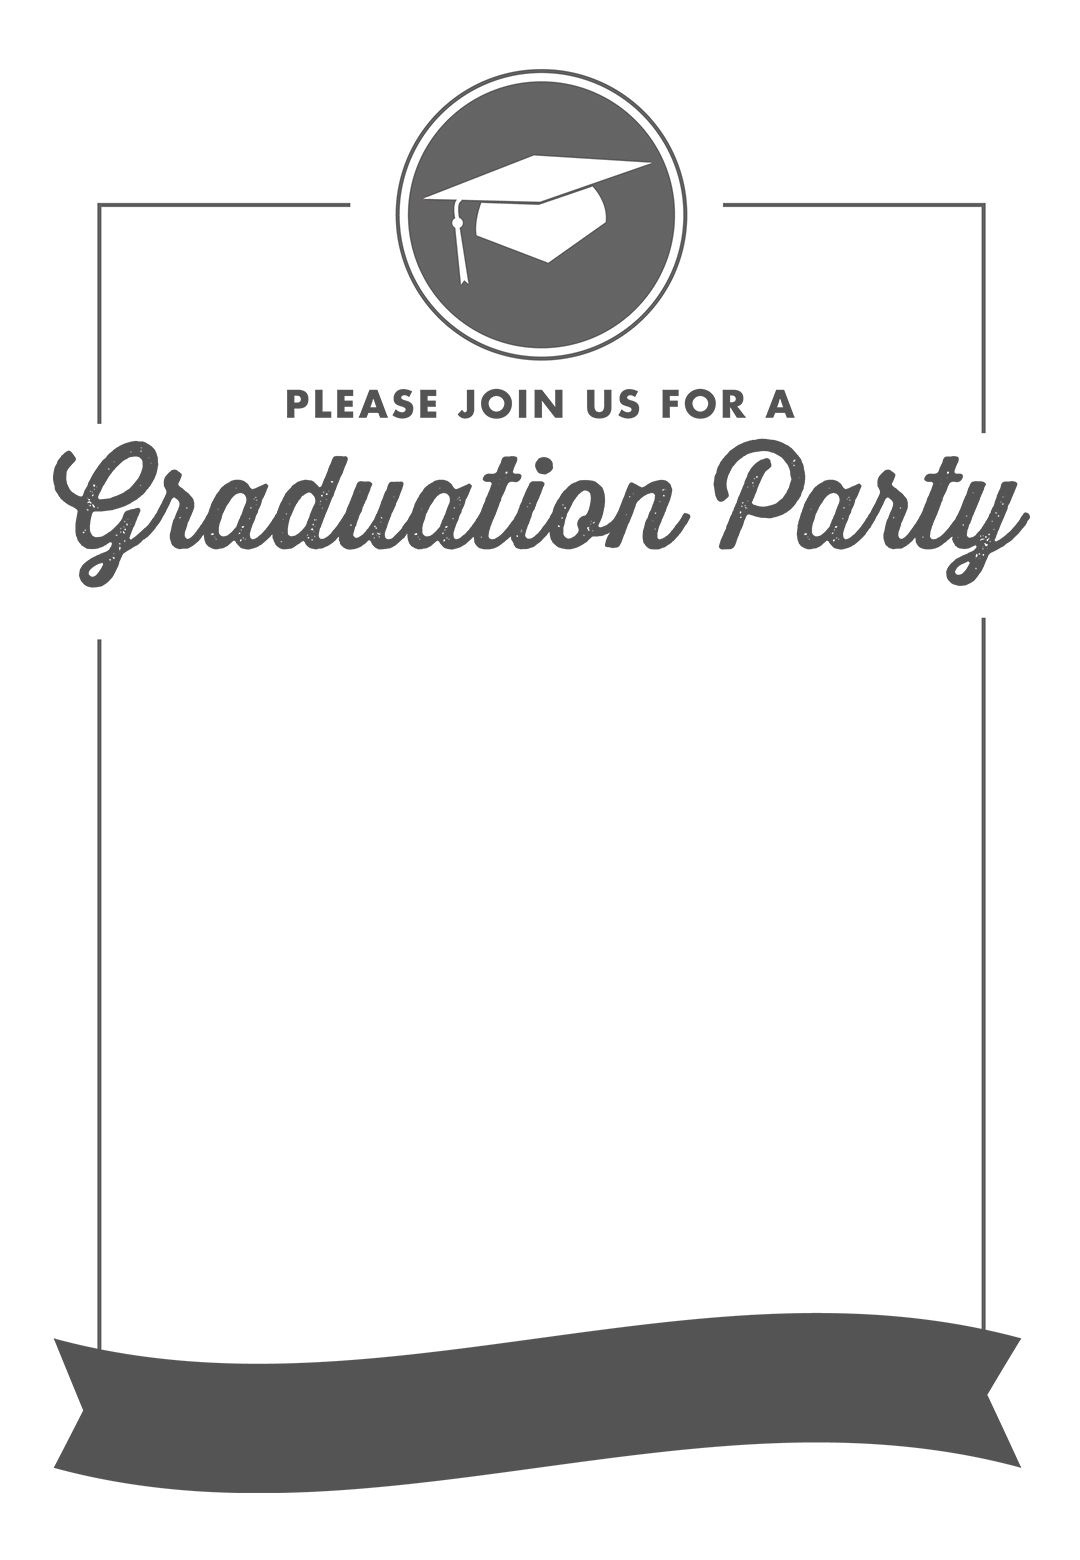 Free Printable Graduation Party Invitation Template | Greetings - Free Printable Graduation Dinner Invitations